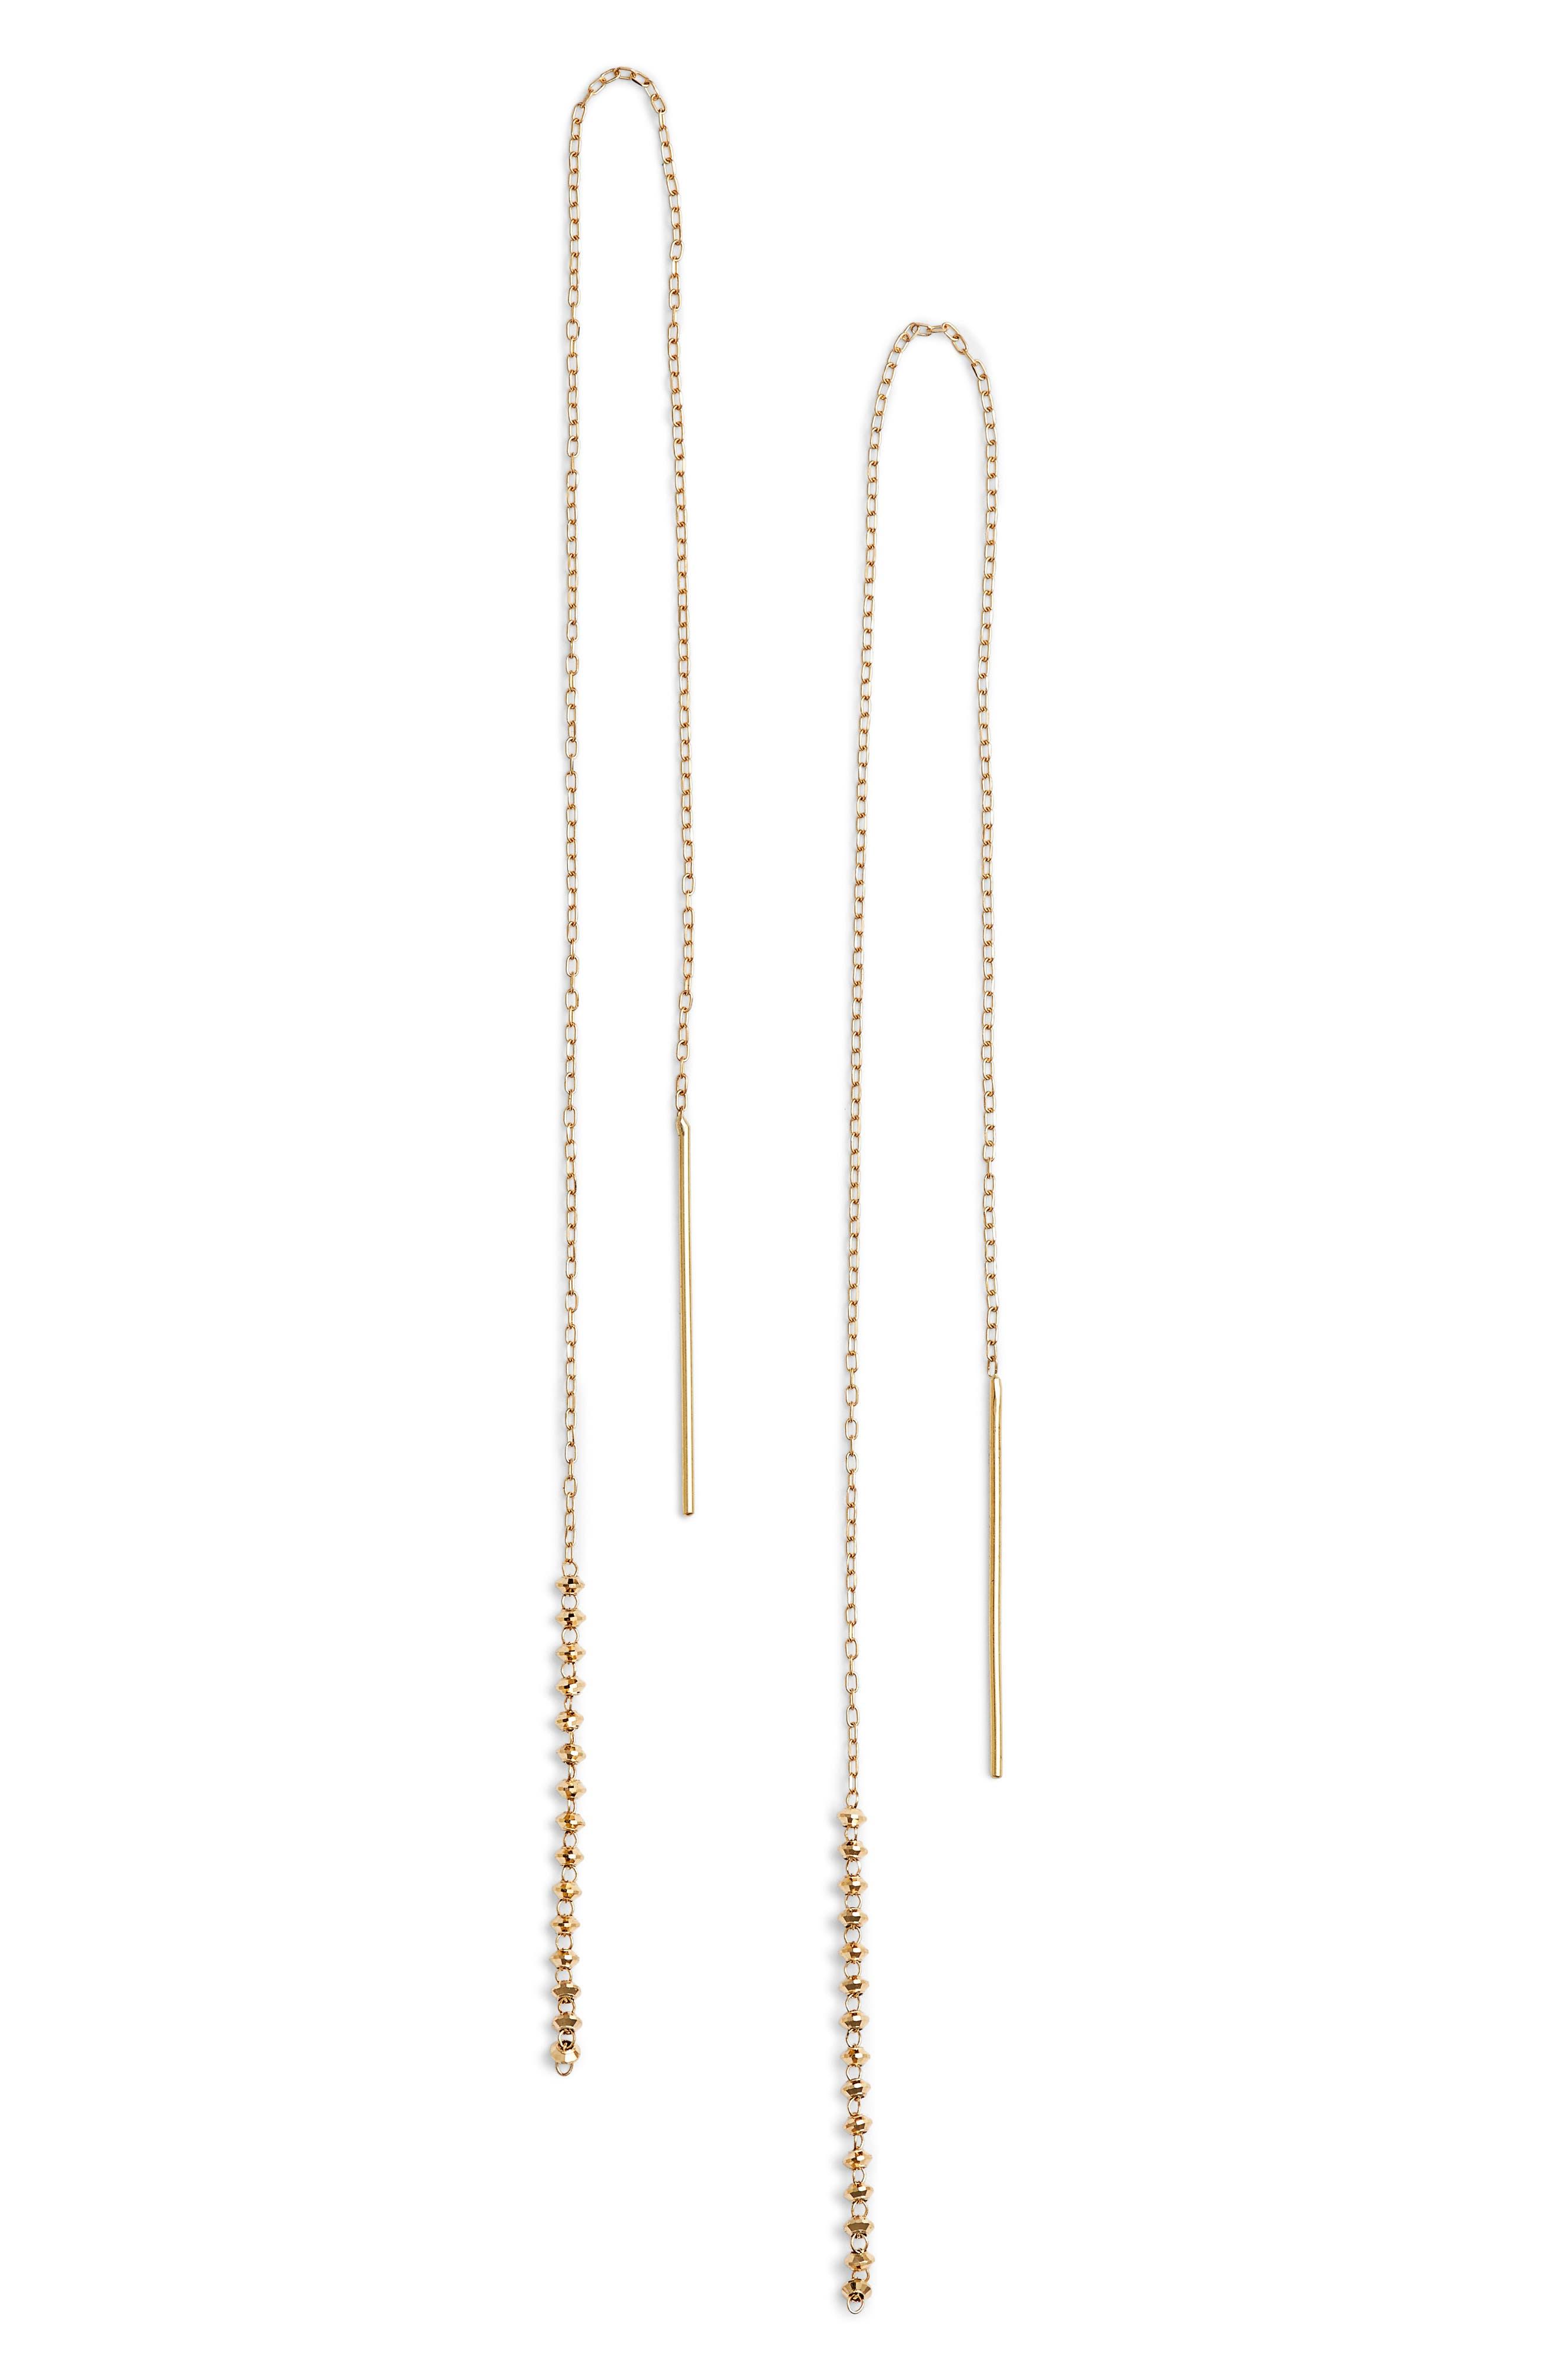 Long Shimmer Threader Earrings,                             Main thumbnail 1, color,                             Yellow Gold